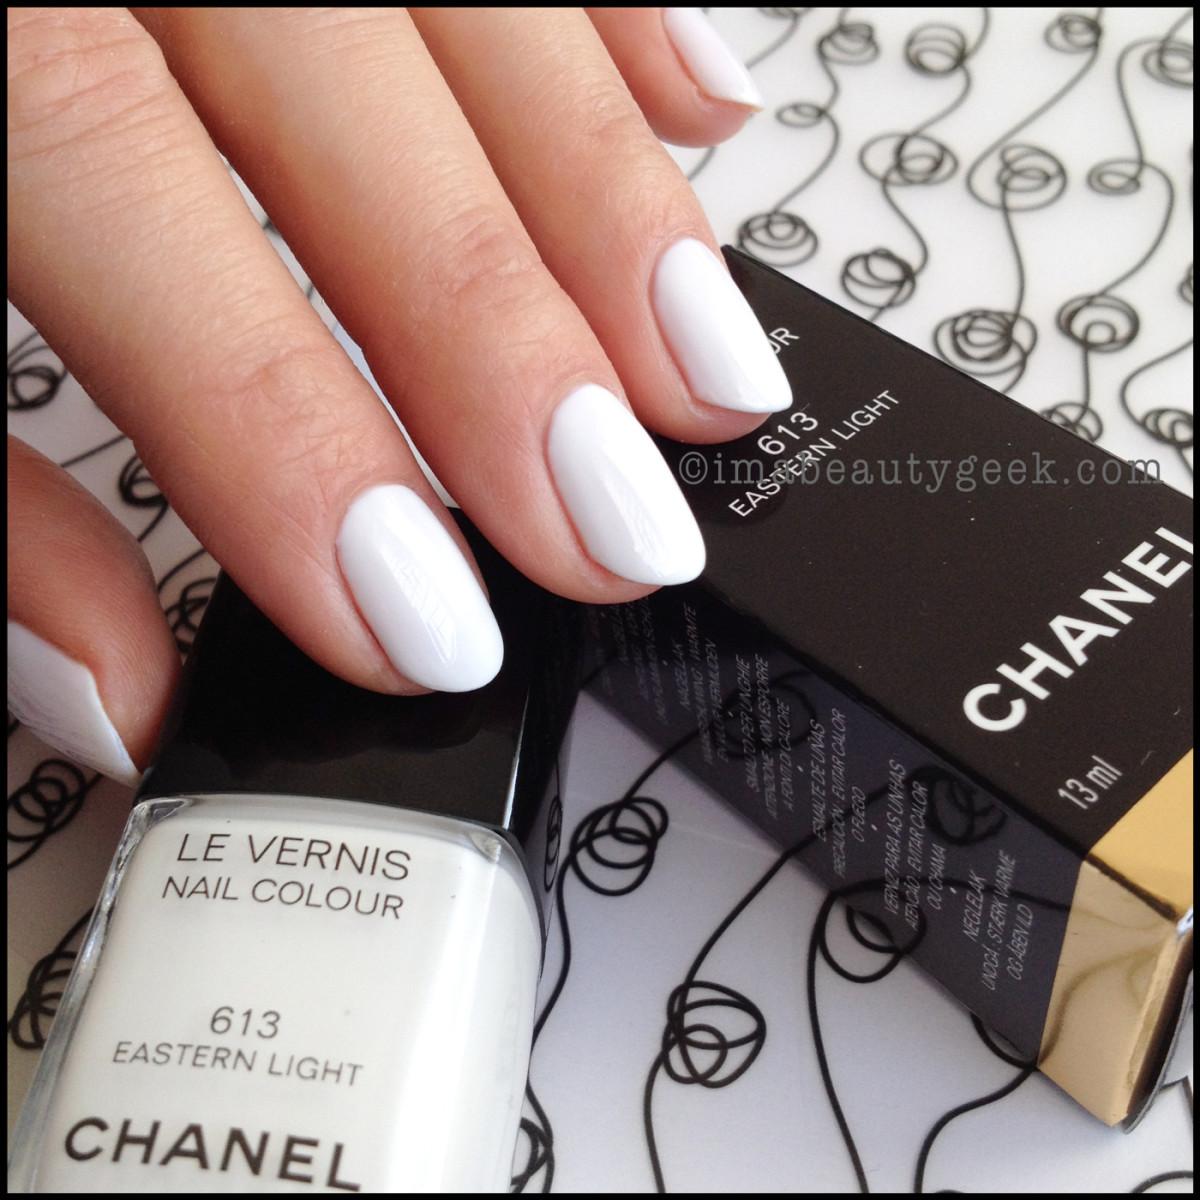 Chanel Summer 2014_Chanel Eastern Light 613 Le Vernis